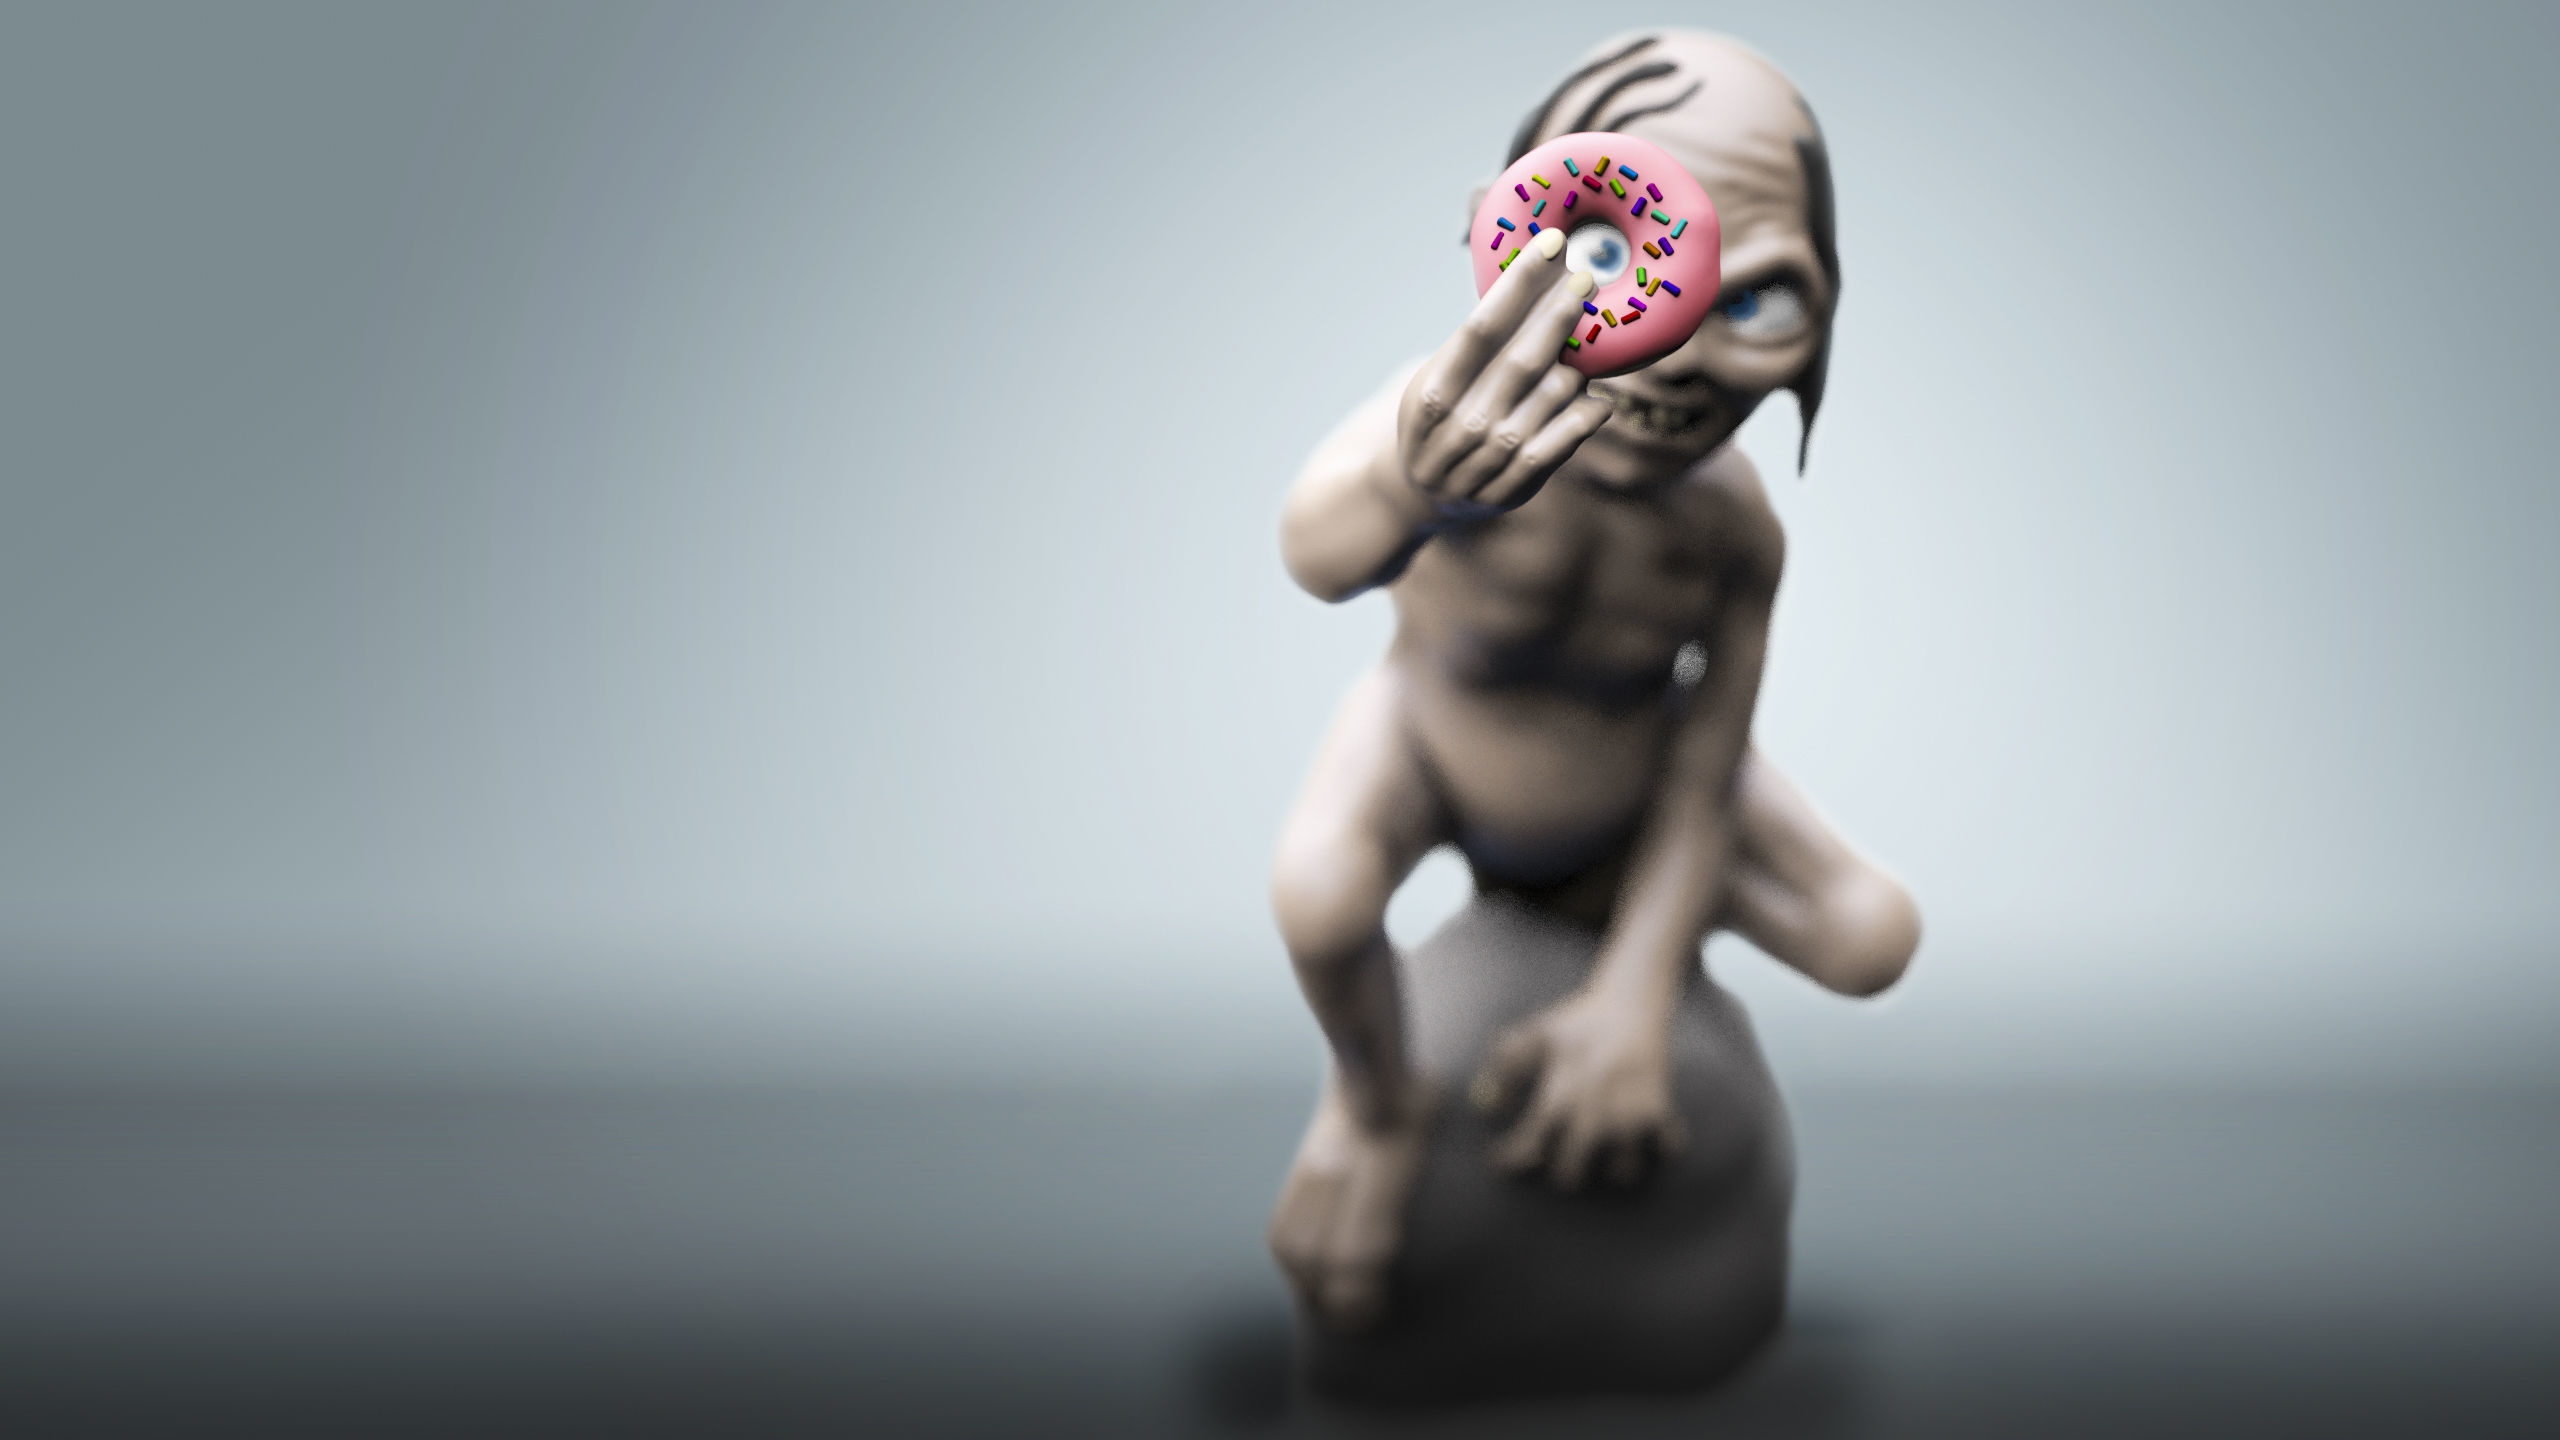 Chubby Gollum